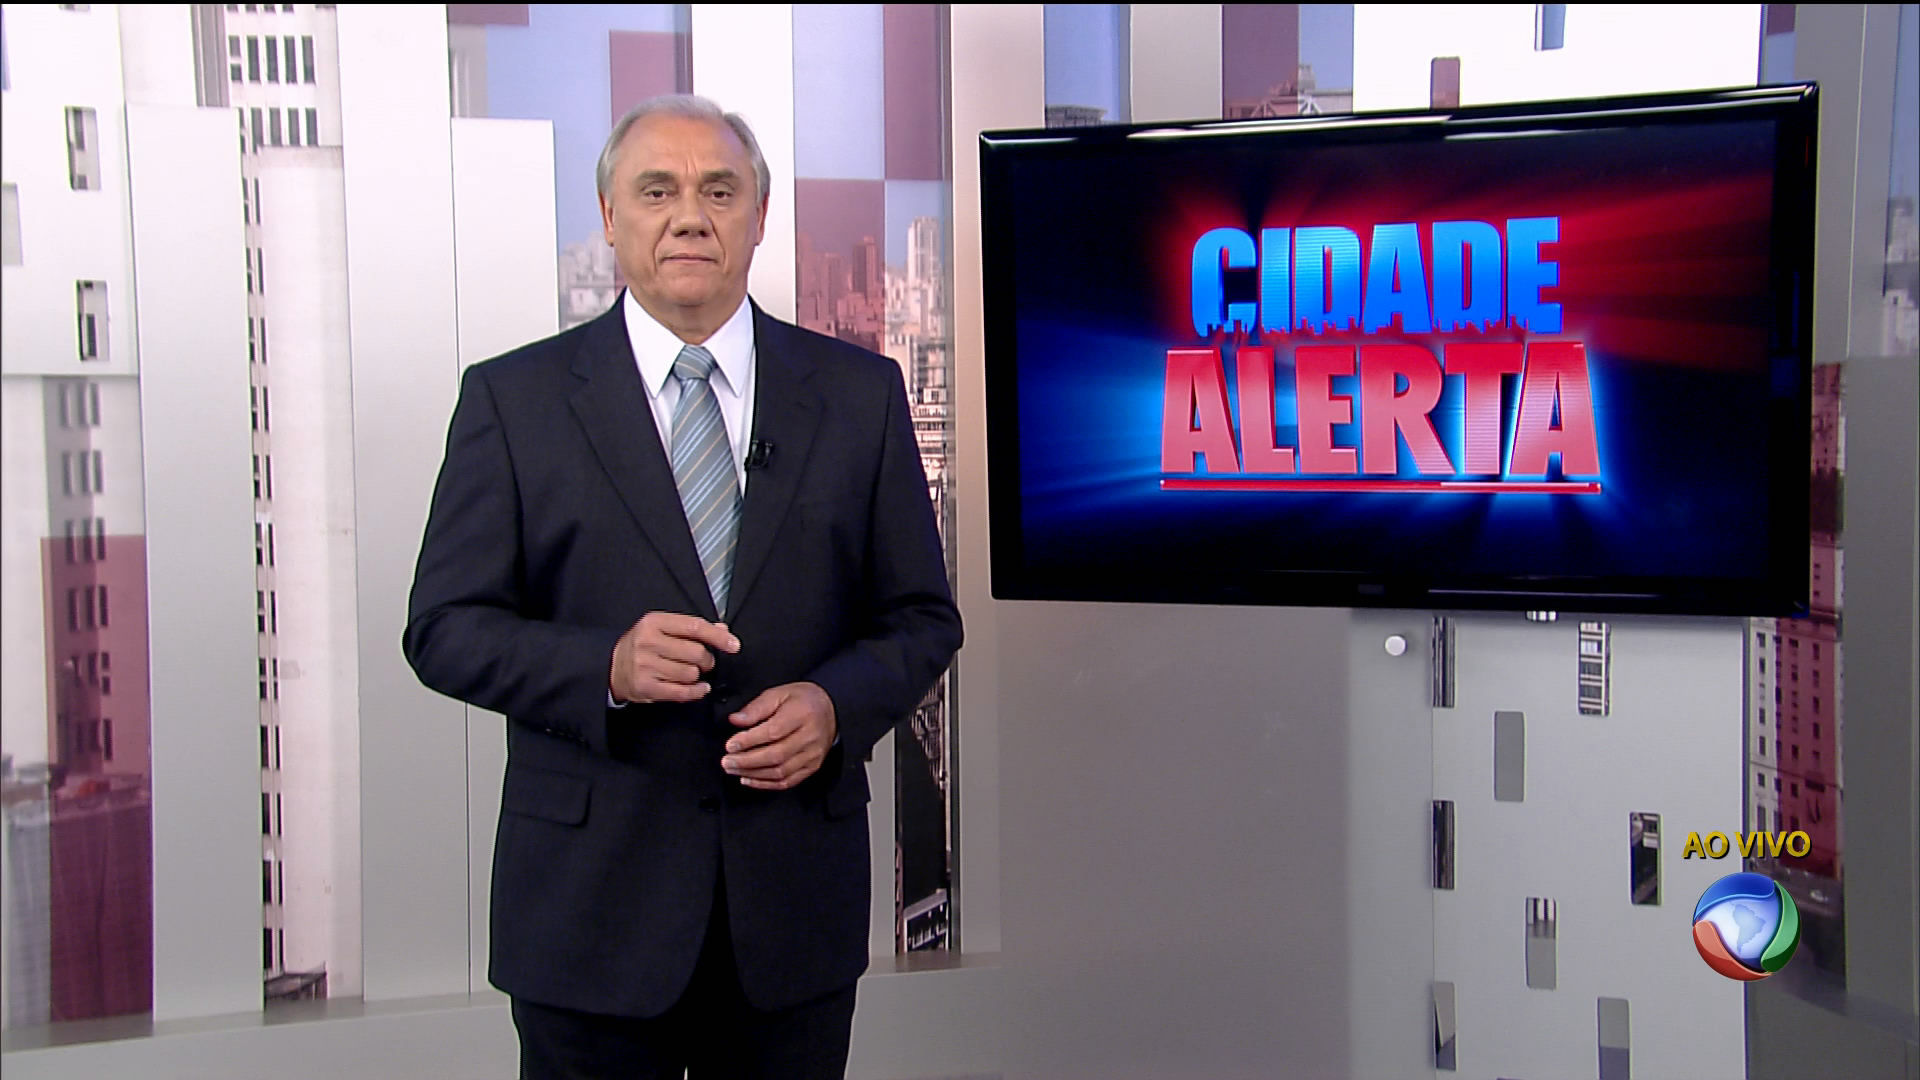 Cidade-Alerta-Marcelo-Rezende.jpg